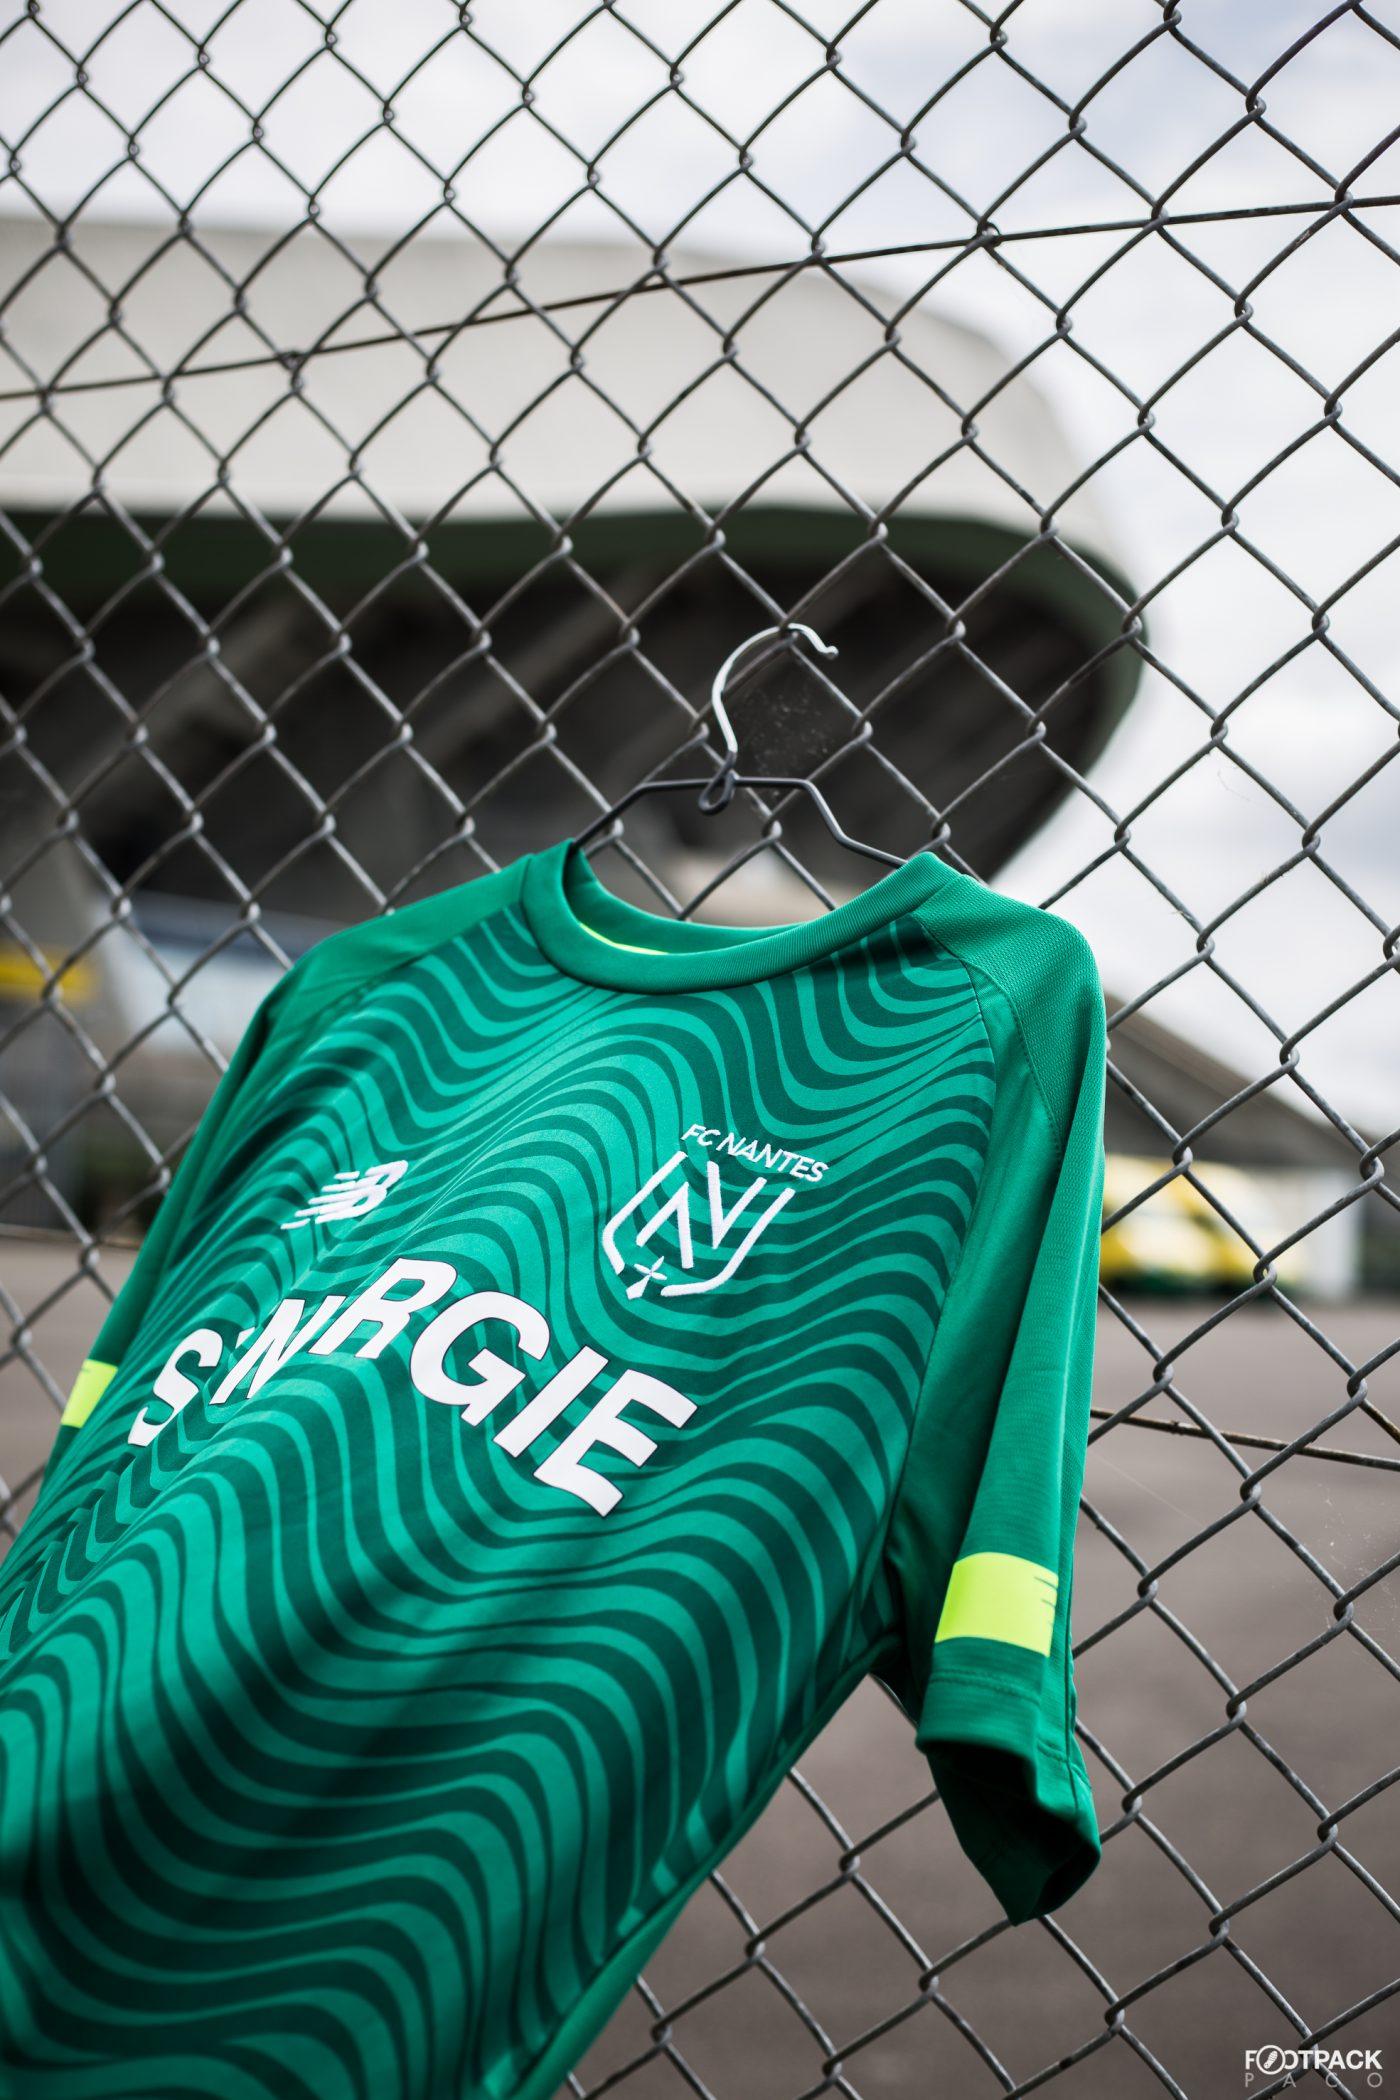 maillot-exterieur-fc-nantes-2019-2020-new-balance-footpack-2